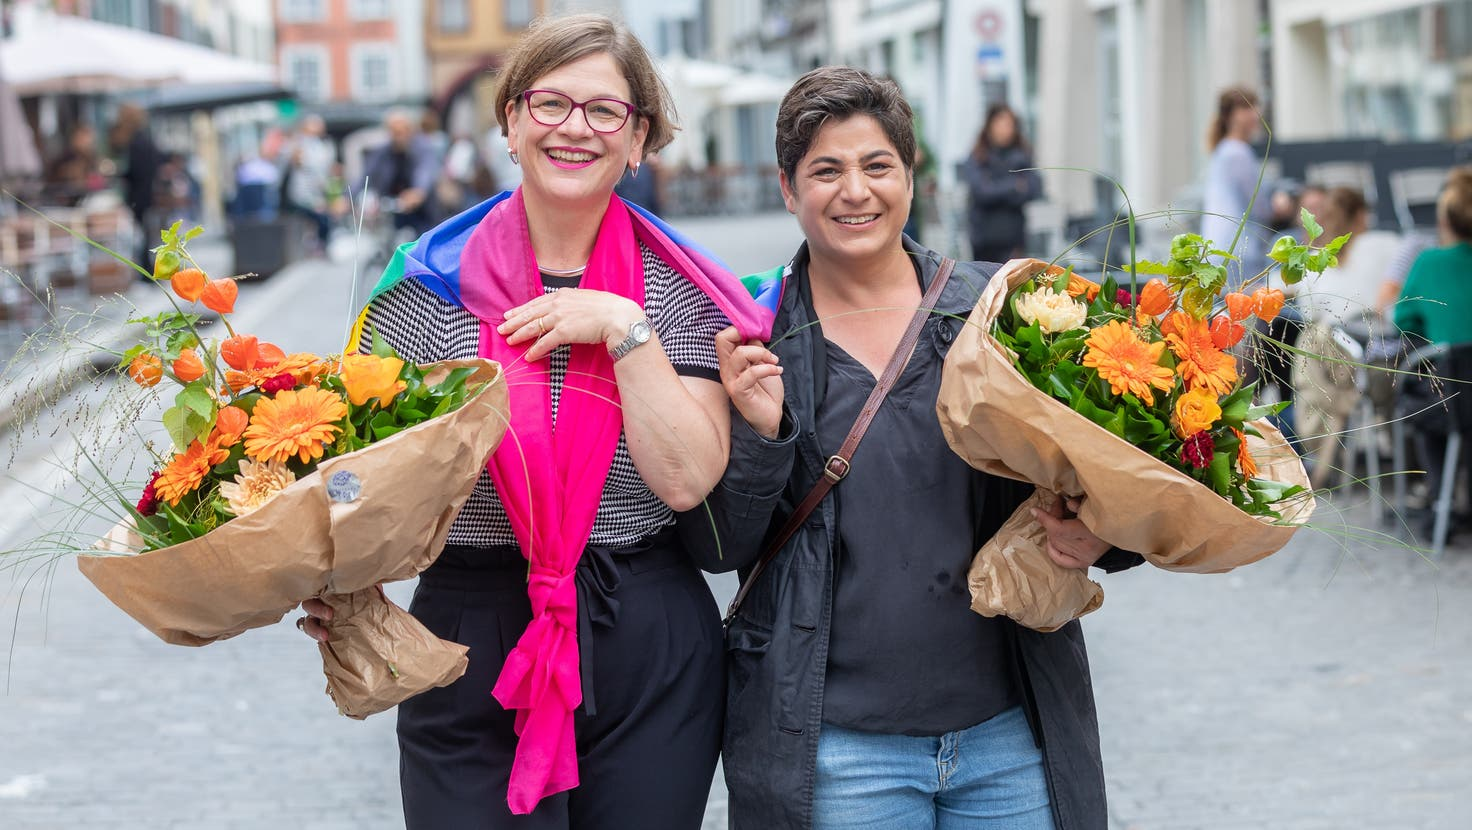 So sehen glückliche Politikerinnen aus: Franziska Graf-Bruppacher und Silvia dell'Aquila in Aarau. (Fabio Baranzini)